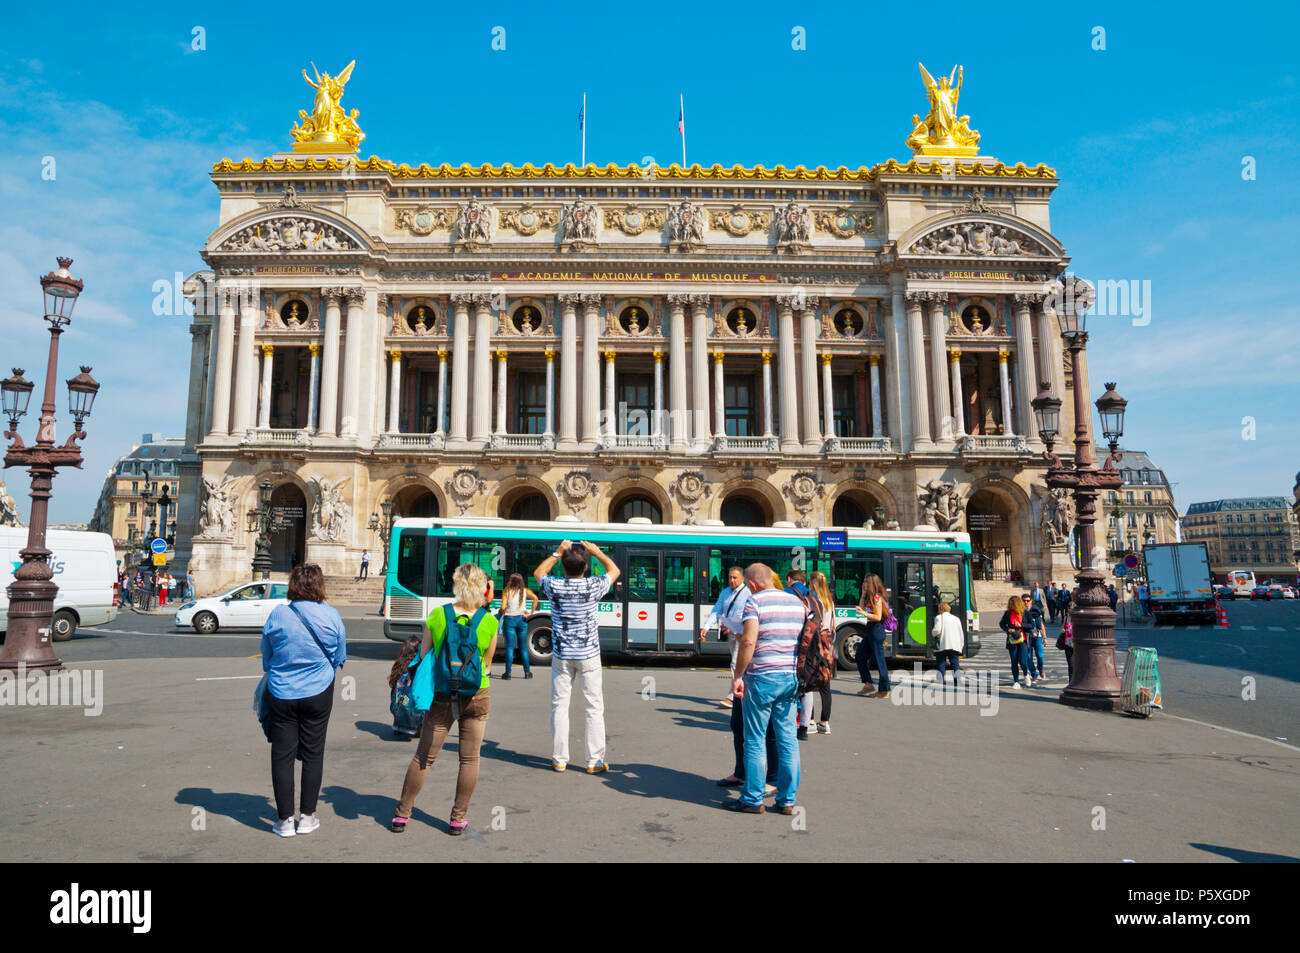 Tourist in front of the Opera House, Palais Garnier, Place de l'Opera, Paris, France - Stock Image